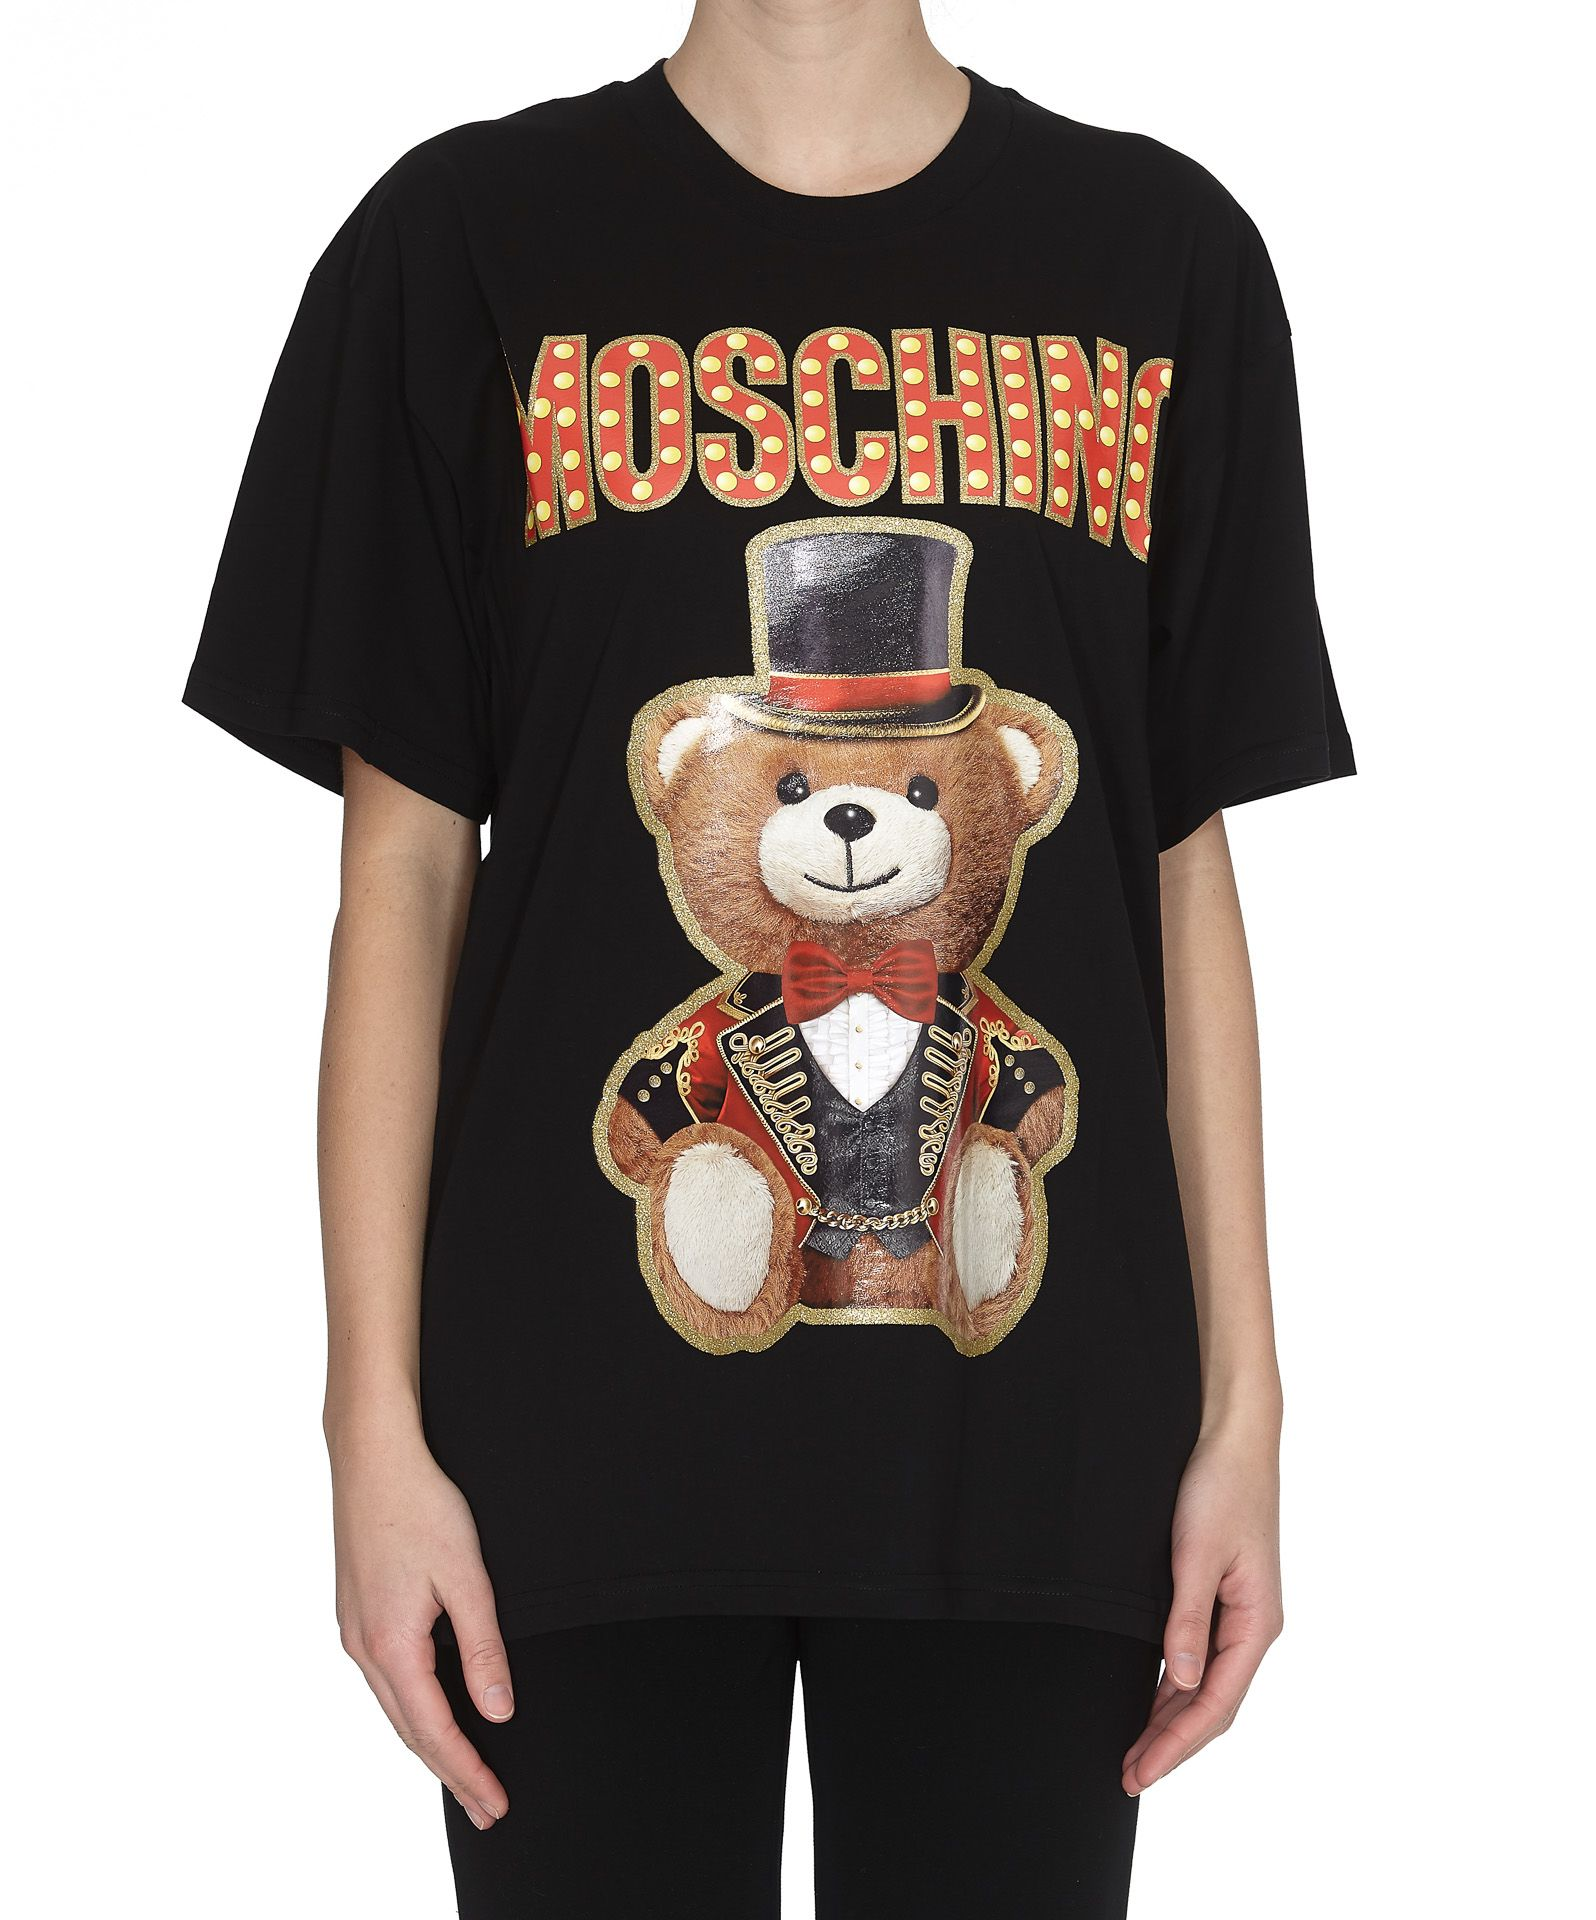 2e8ffae5 Moschino Moschino Teddy Circus T-shirt - Black - 10786840 | italist